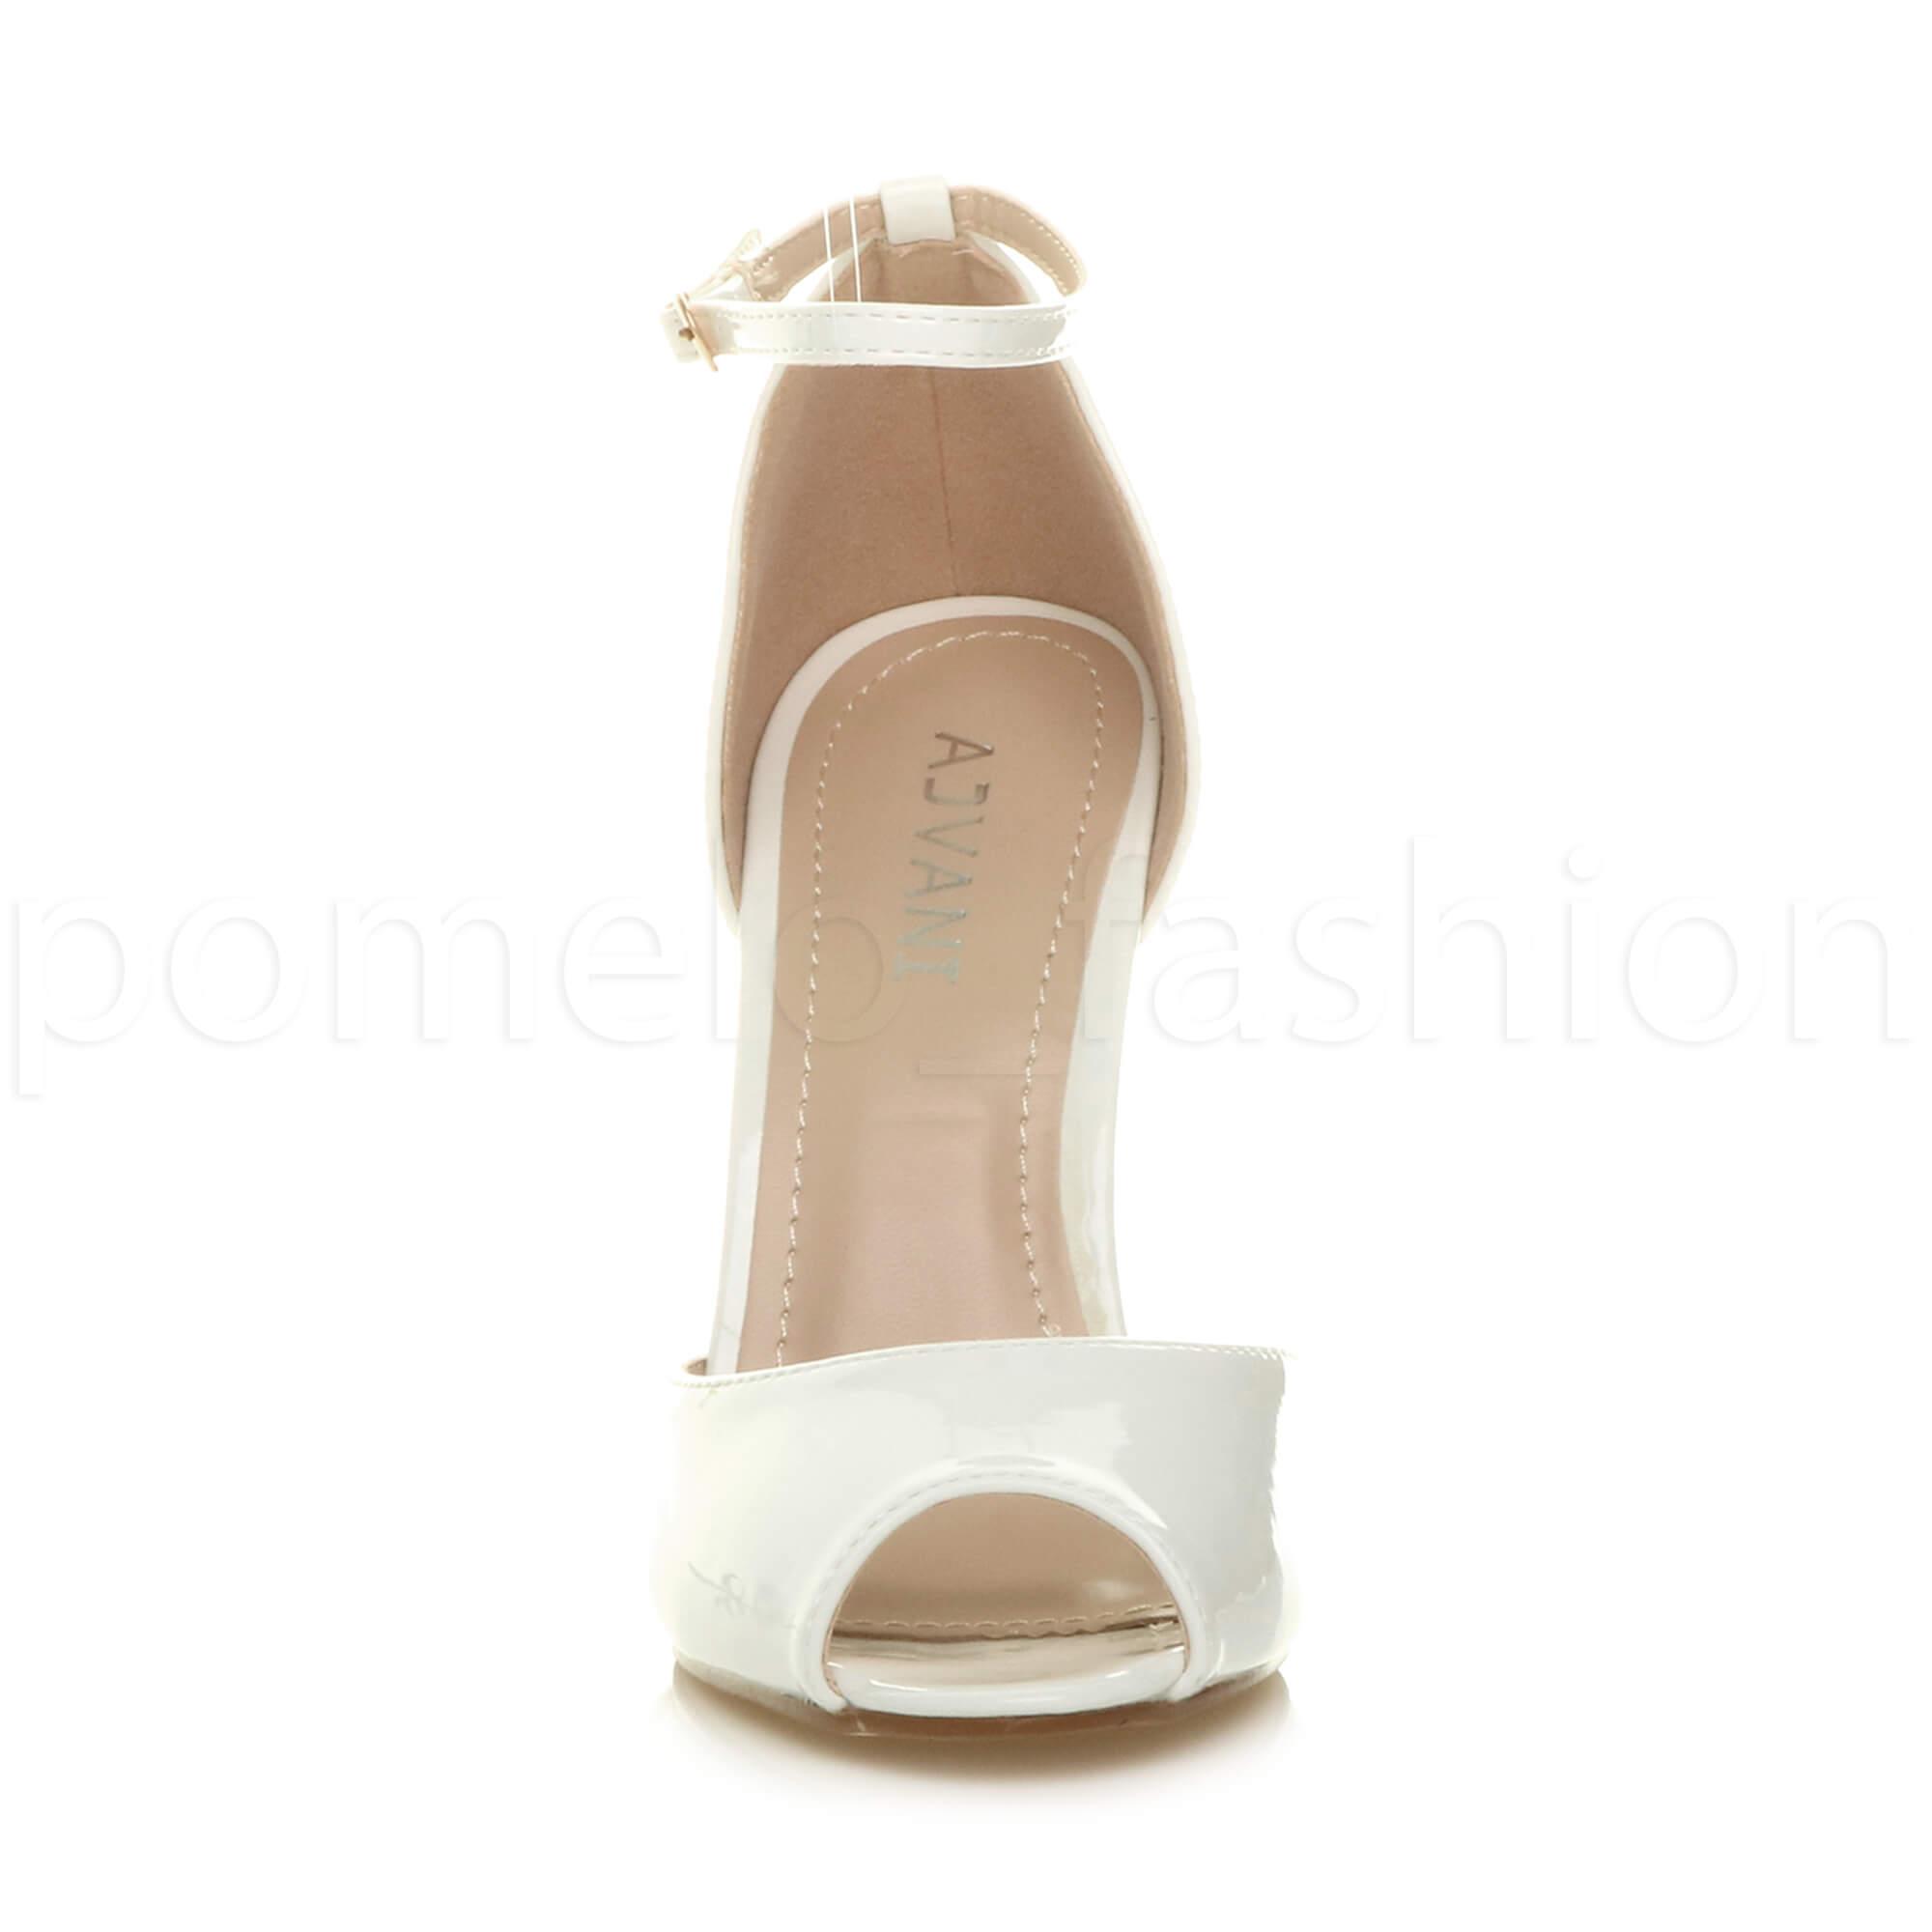 WOMENS-LADIES-HIGH-HEEL-WEDDING-BRIDESMAID-EVENING-STILETTOS-PEEP-TOE-SHOES-SIZE thumbnail 90